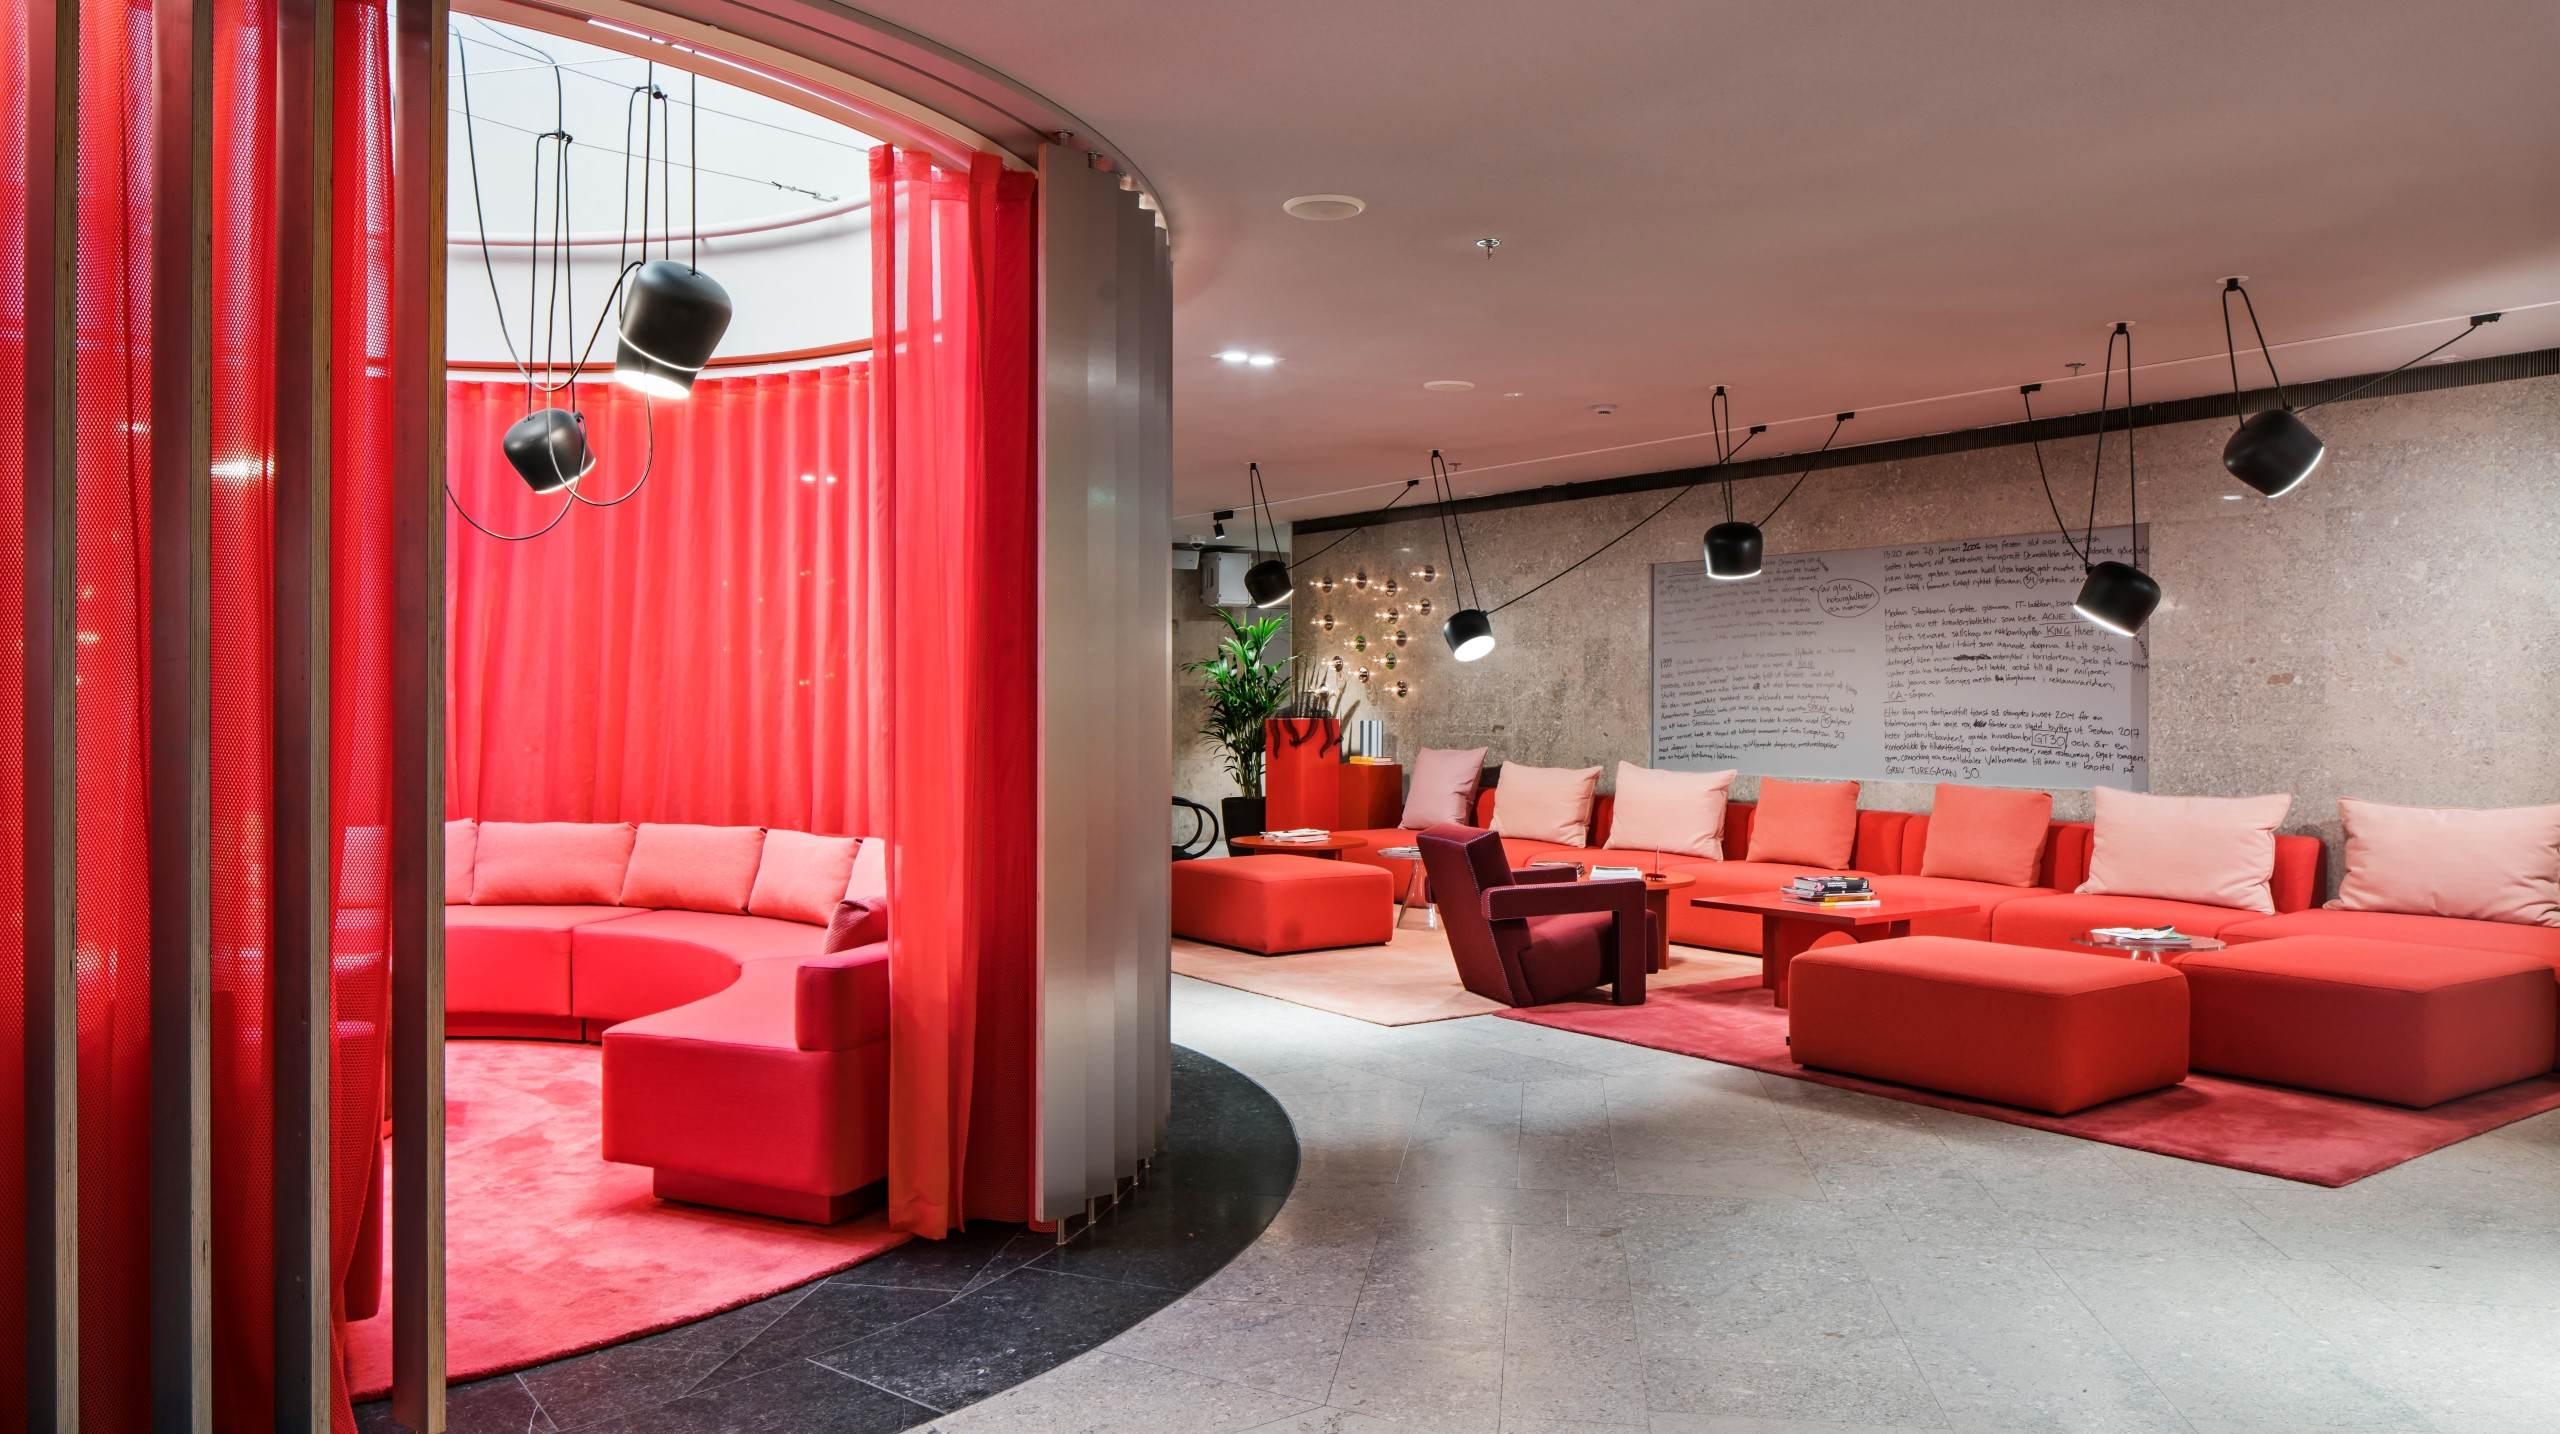 Helio GT30, kontorshotell i Stockholm. Fotograferat av arkitekturfotograf Mattias Hamrén.